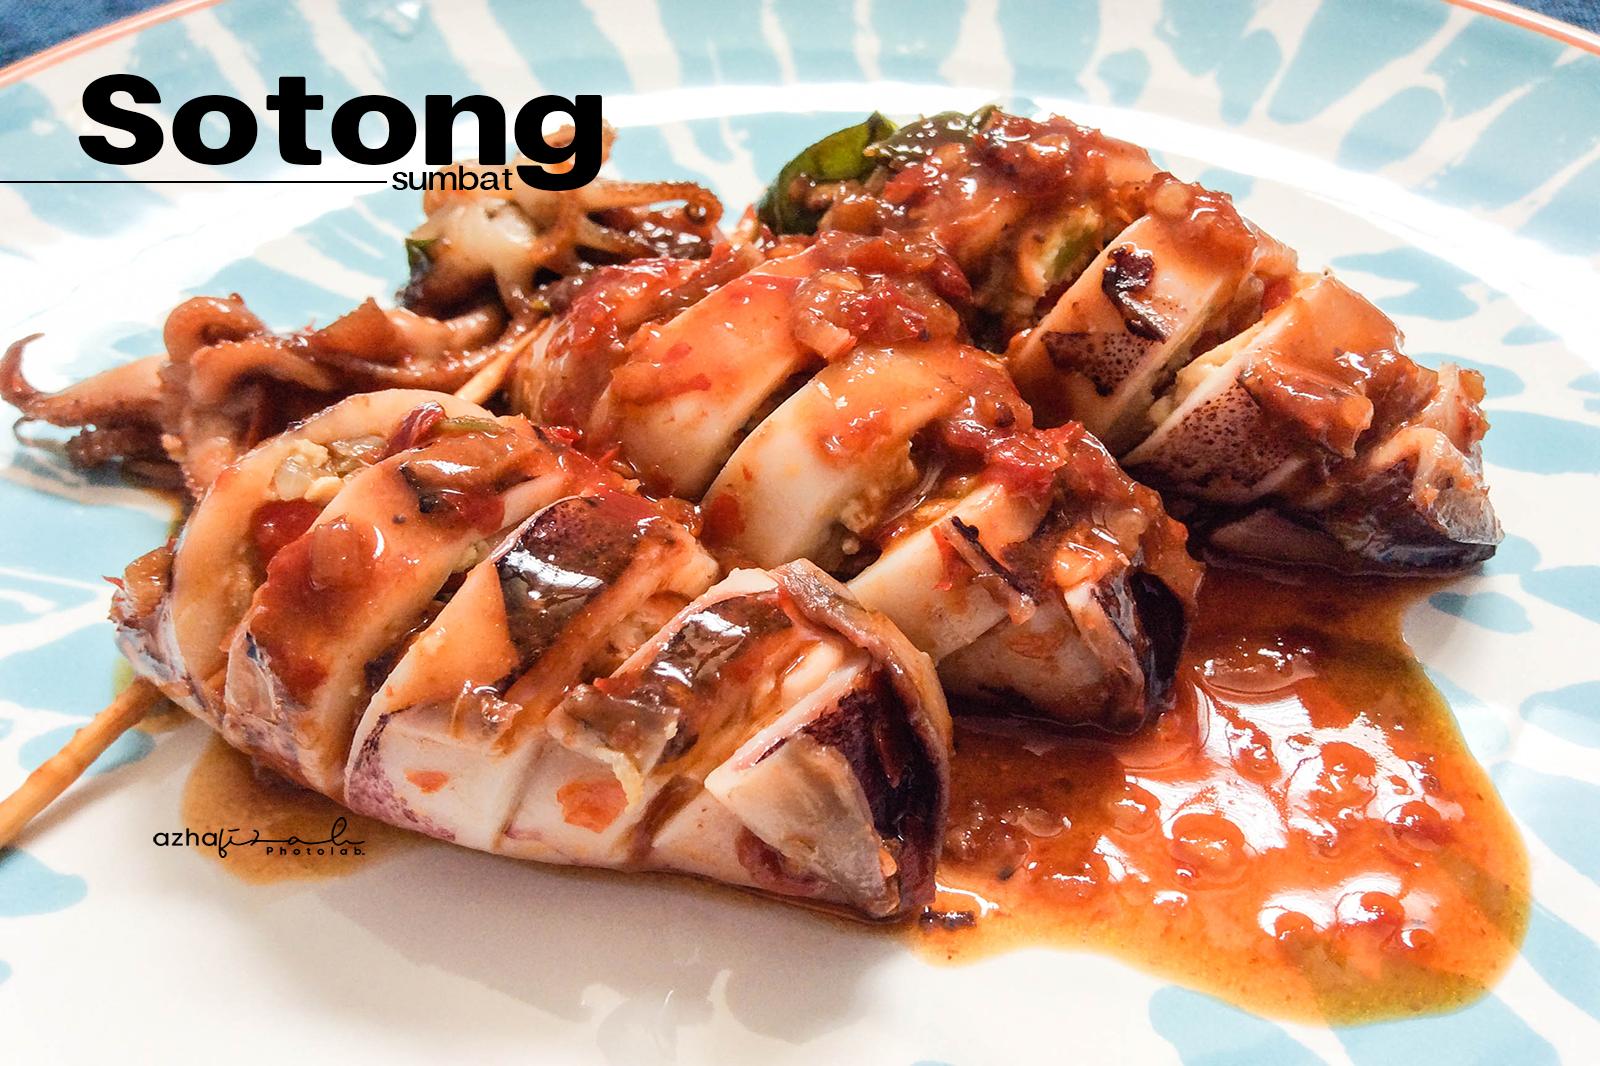 masakan sotong  sedap resepi sotong masak kicap sedap resep masakan khas panaskan Resepi Ikan Masak Tau Enak dan Mudah